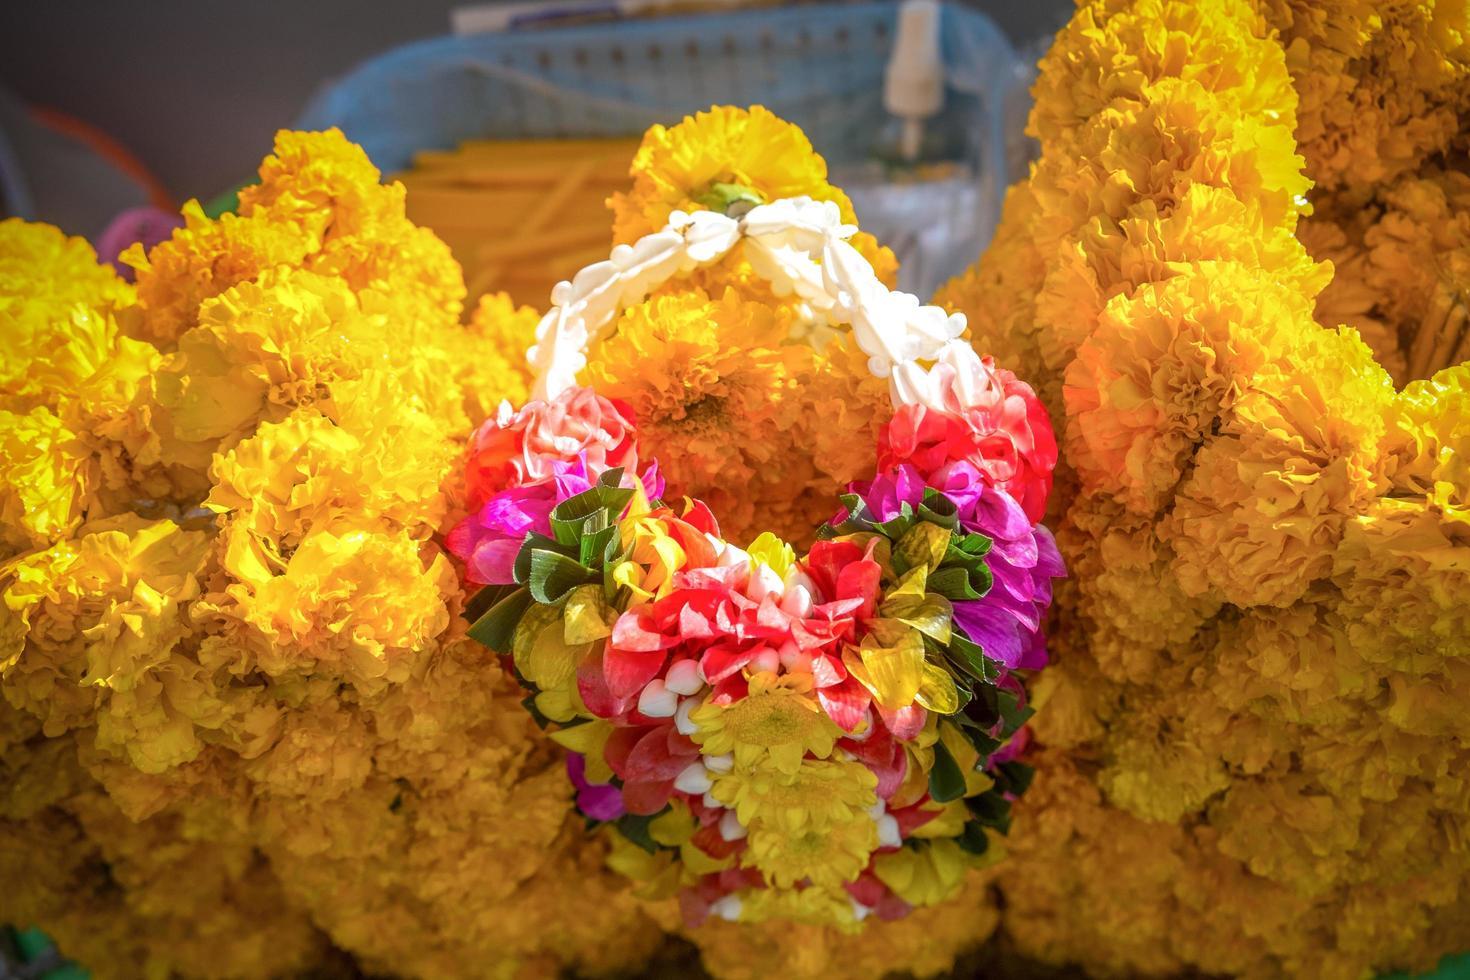 ghirlanda floreale in vendita presso il santuario di erawan foto